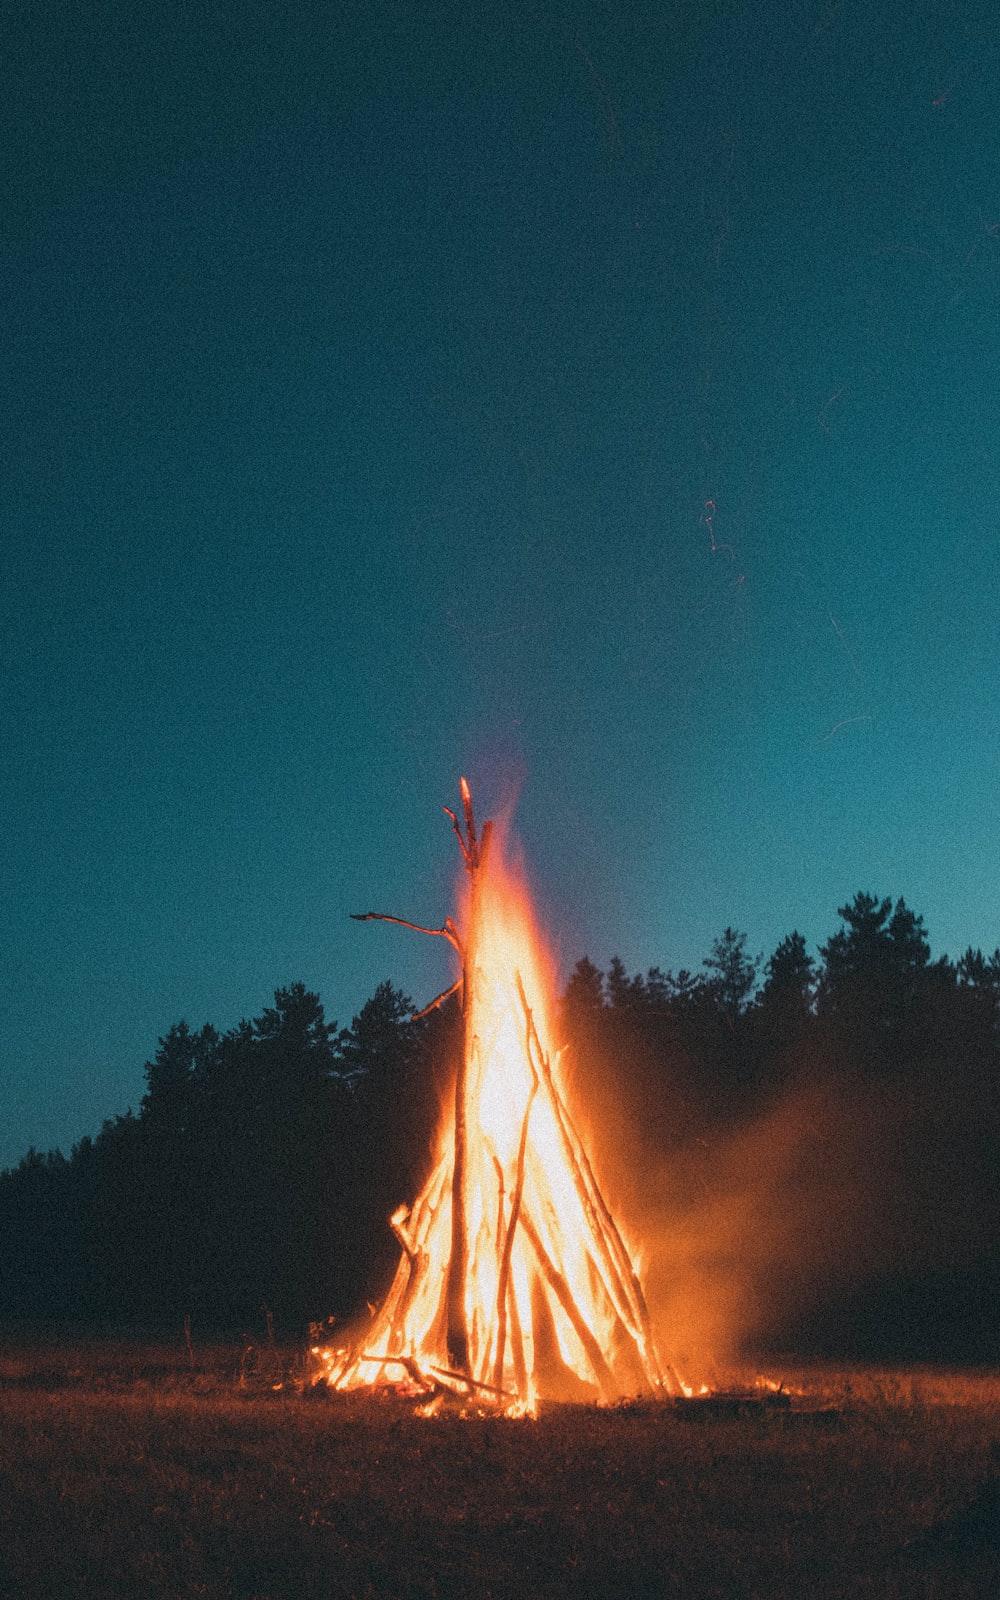 bonfire under blue sky during nighttime